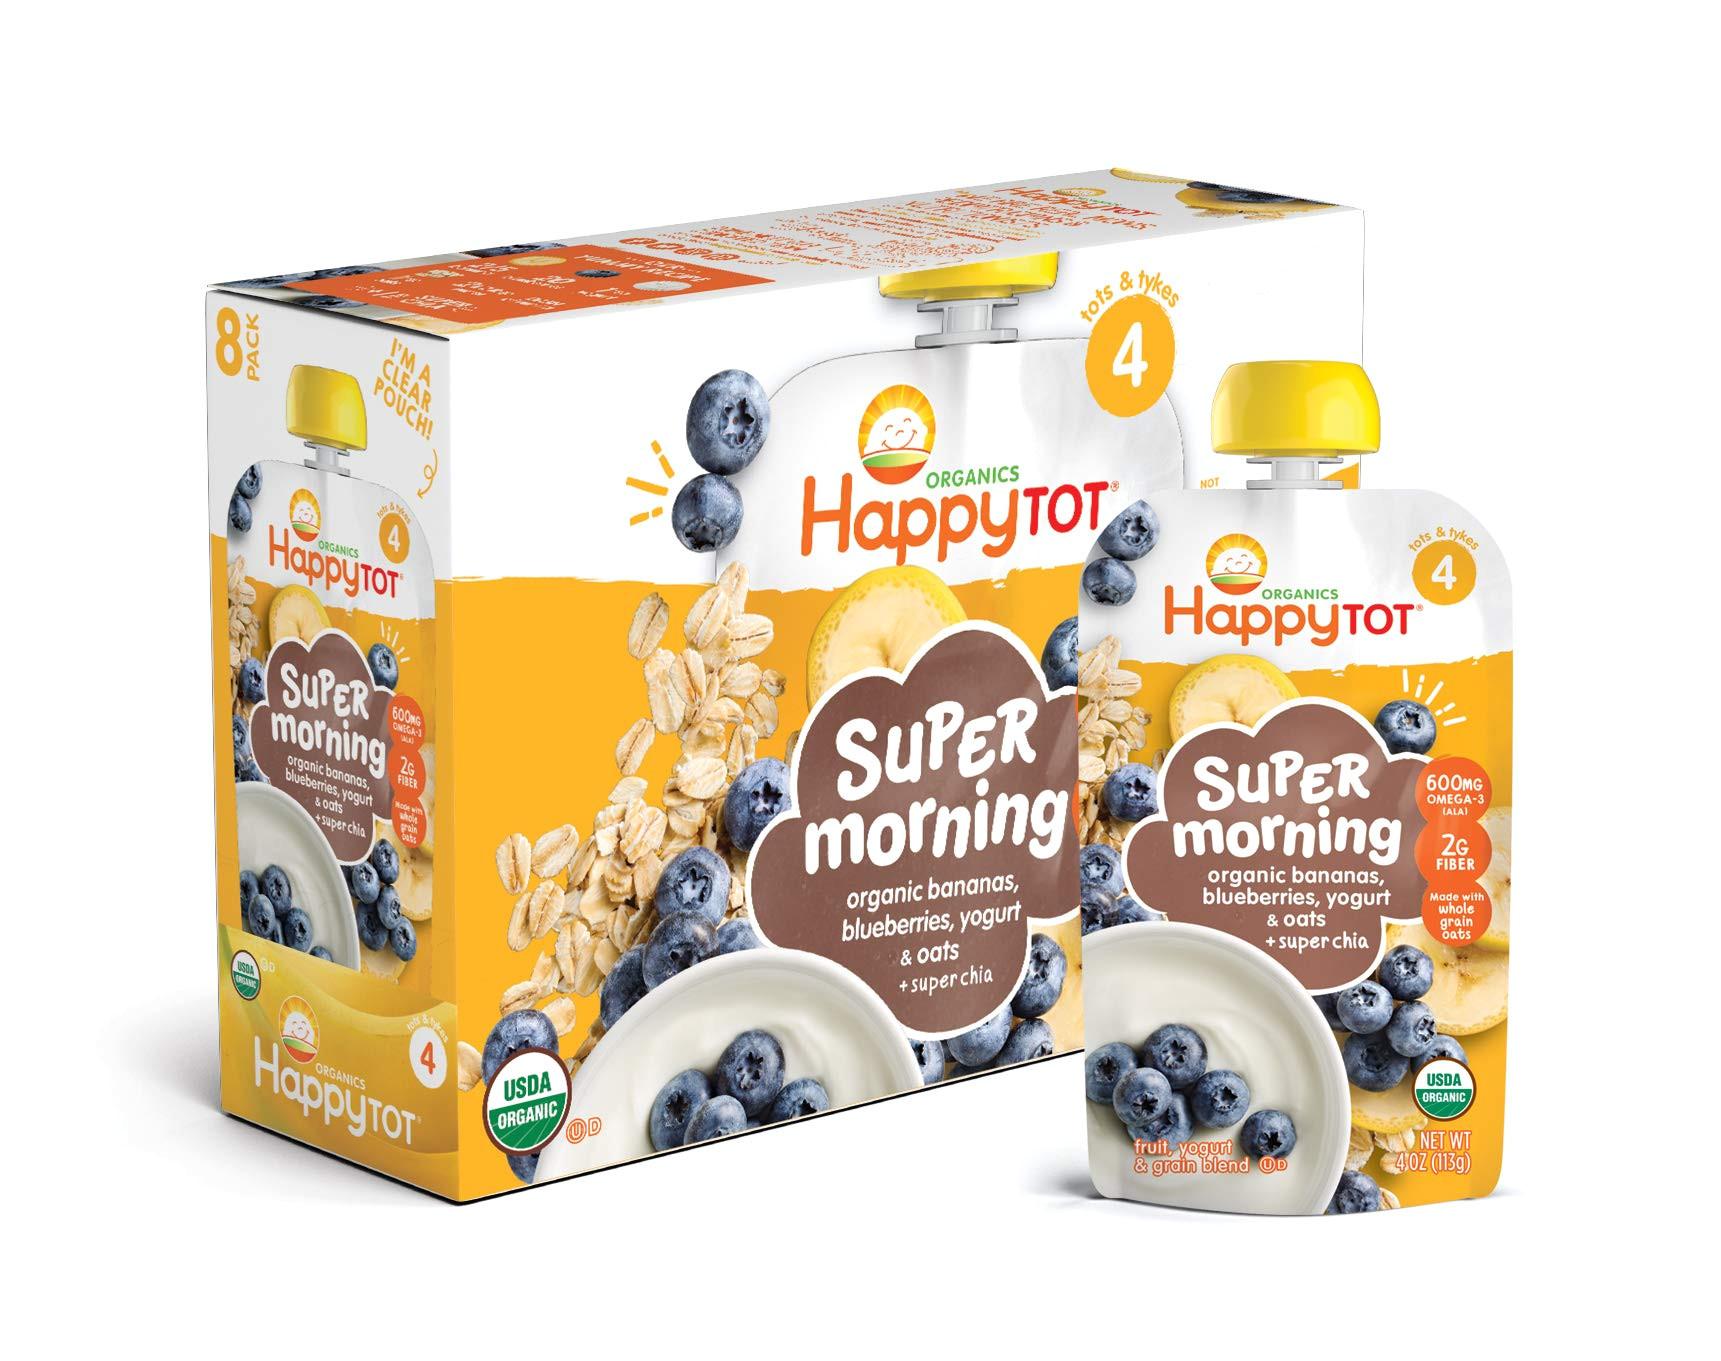 happy tot organic stage 4 super morning organic bananas blueberries yogurt oats super chia